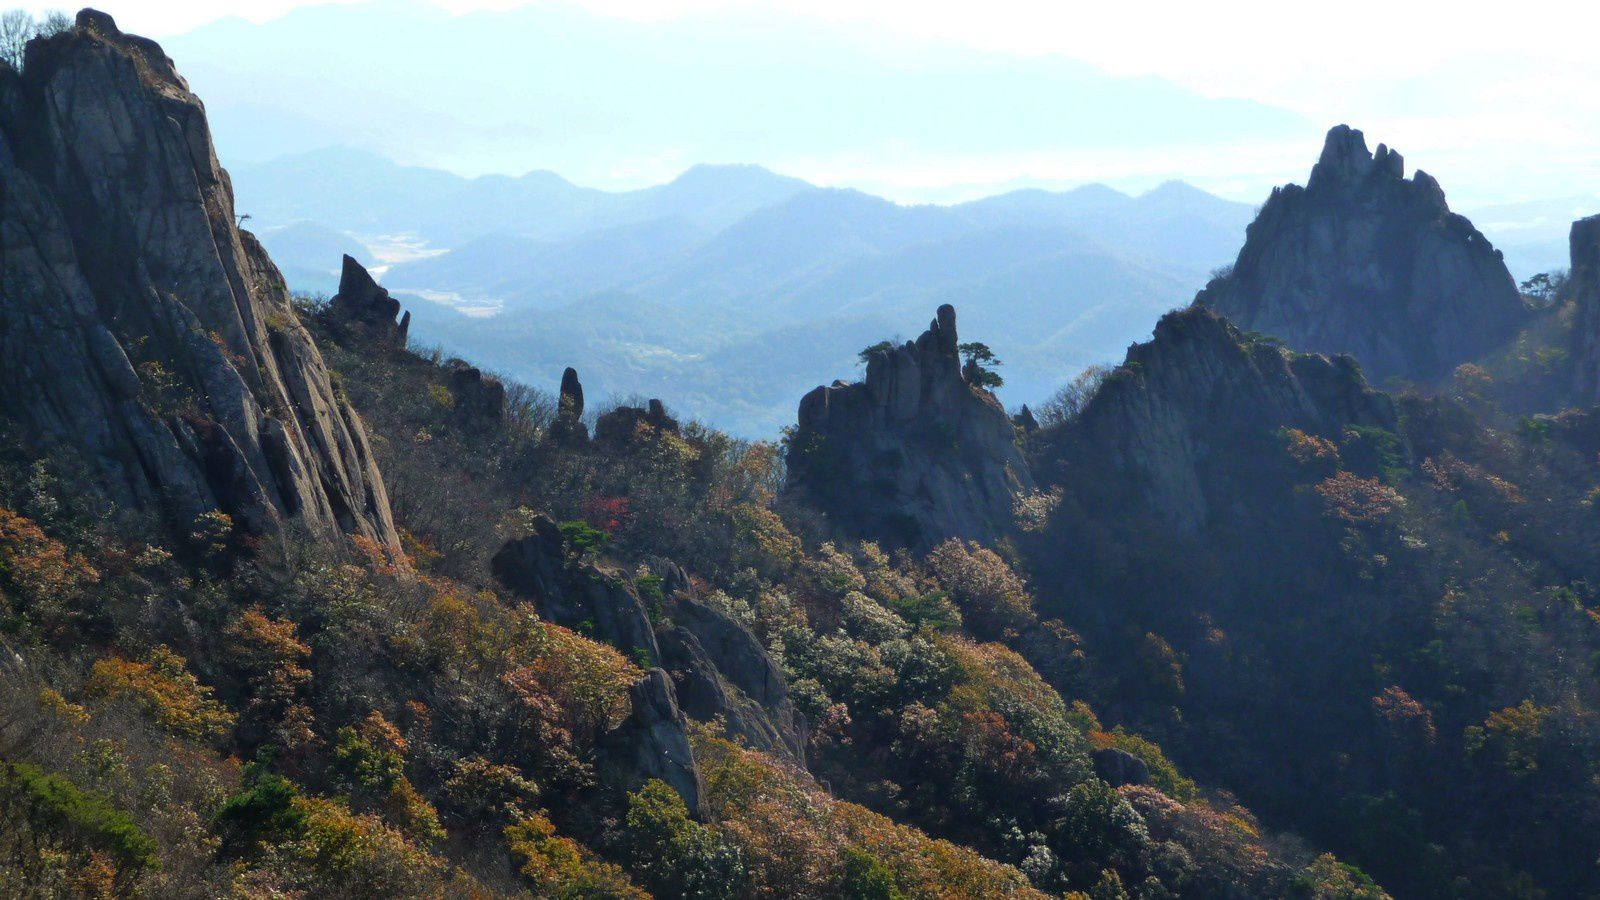 Corée - Wolchulsan national park